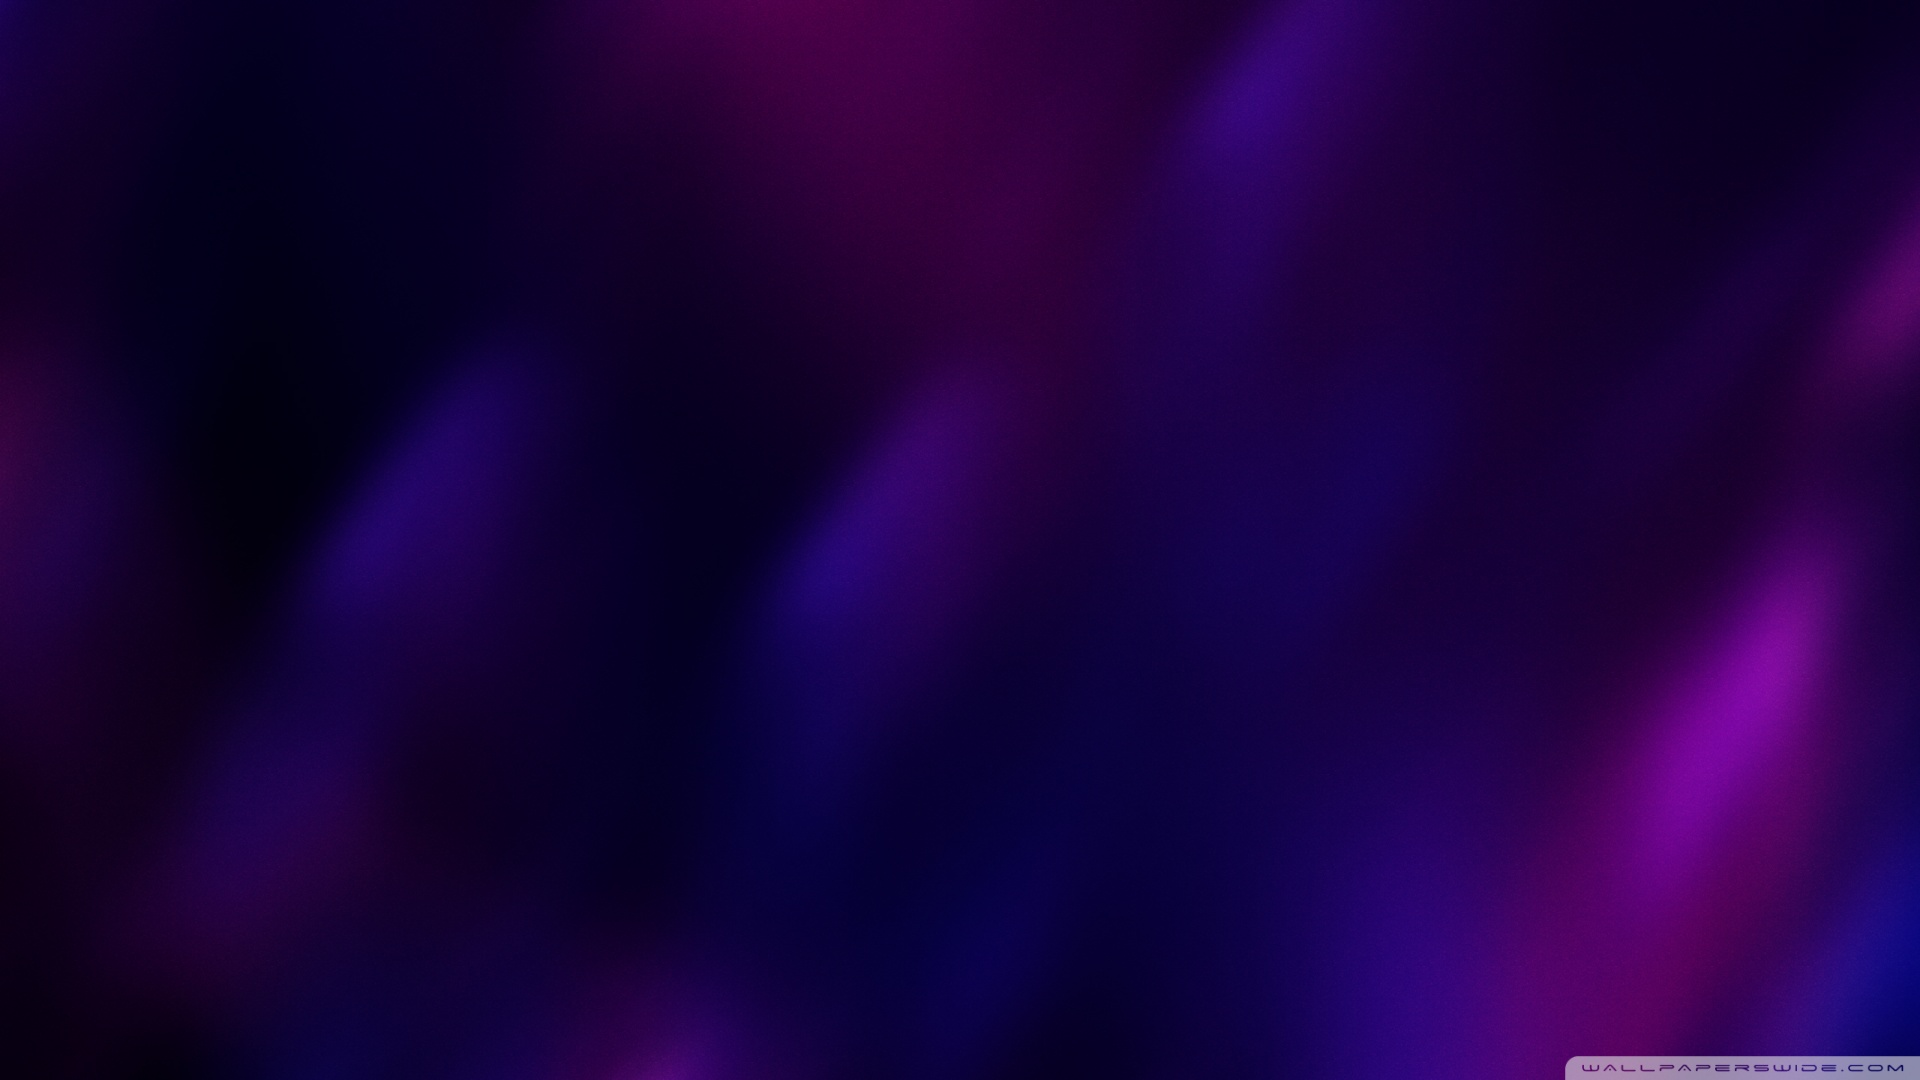 Purple Color Wallpapers Dark purple colors wallpaper 1920x1080